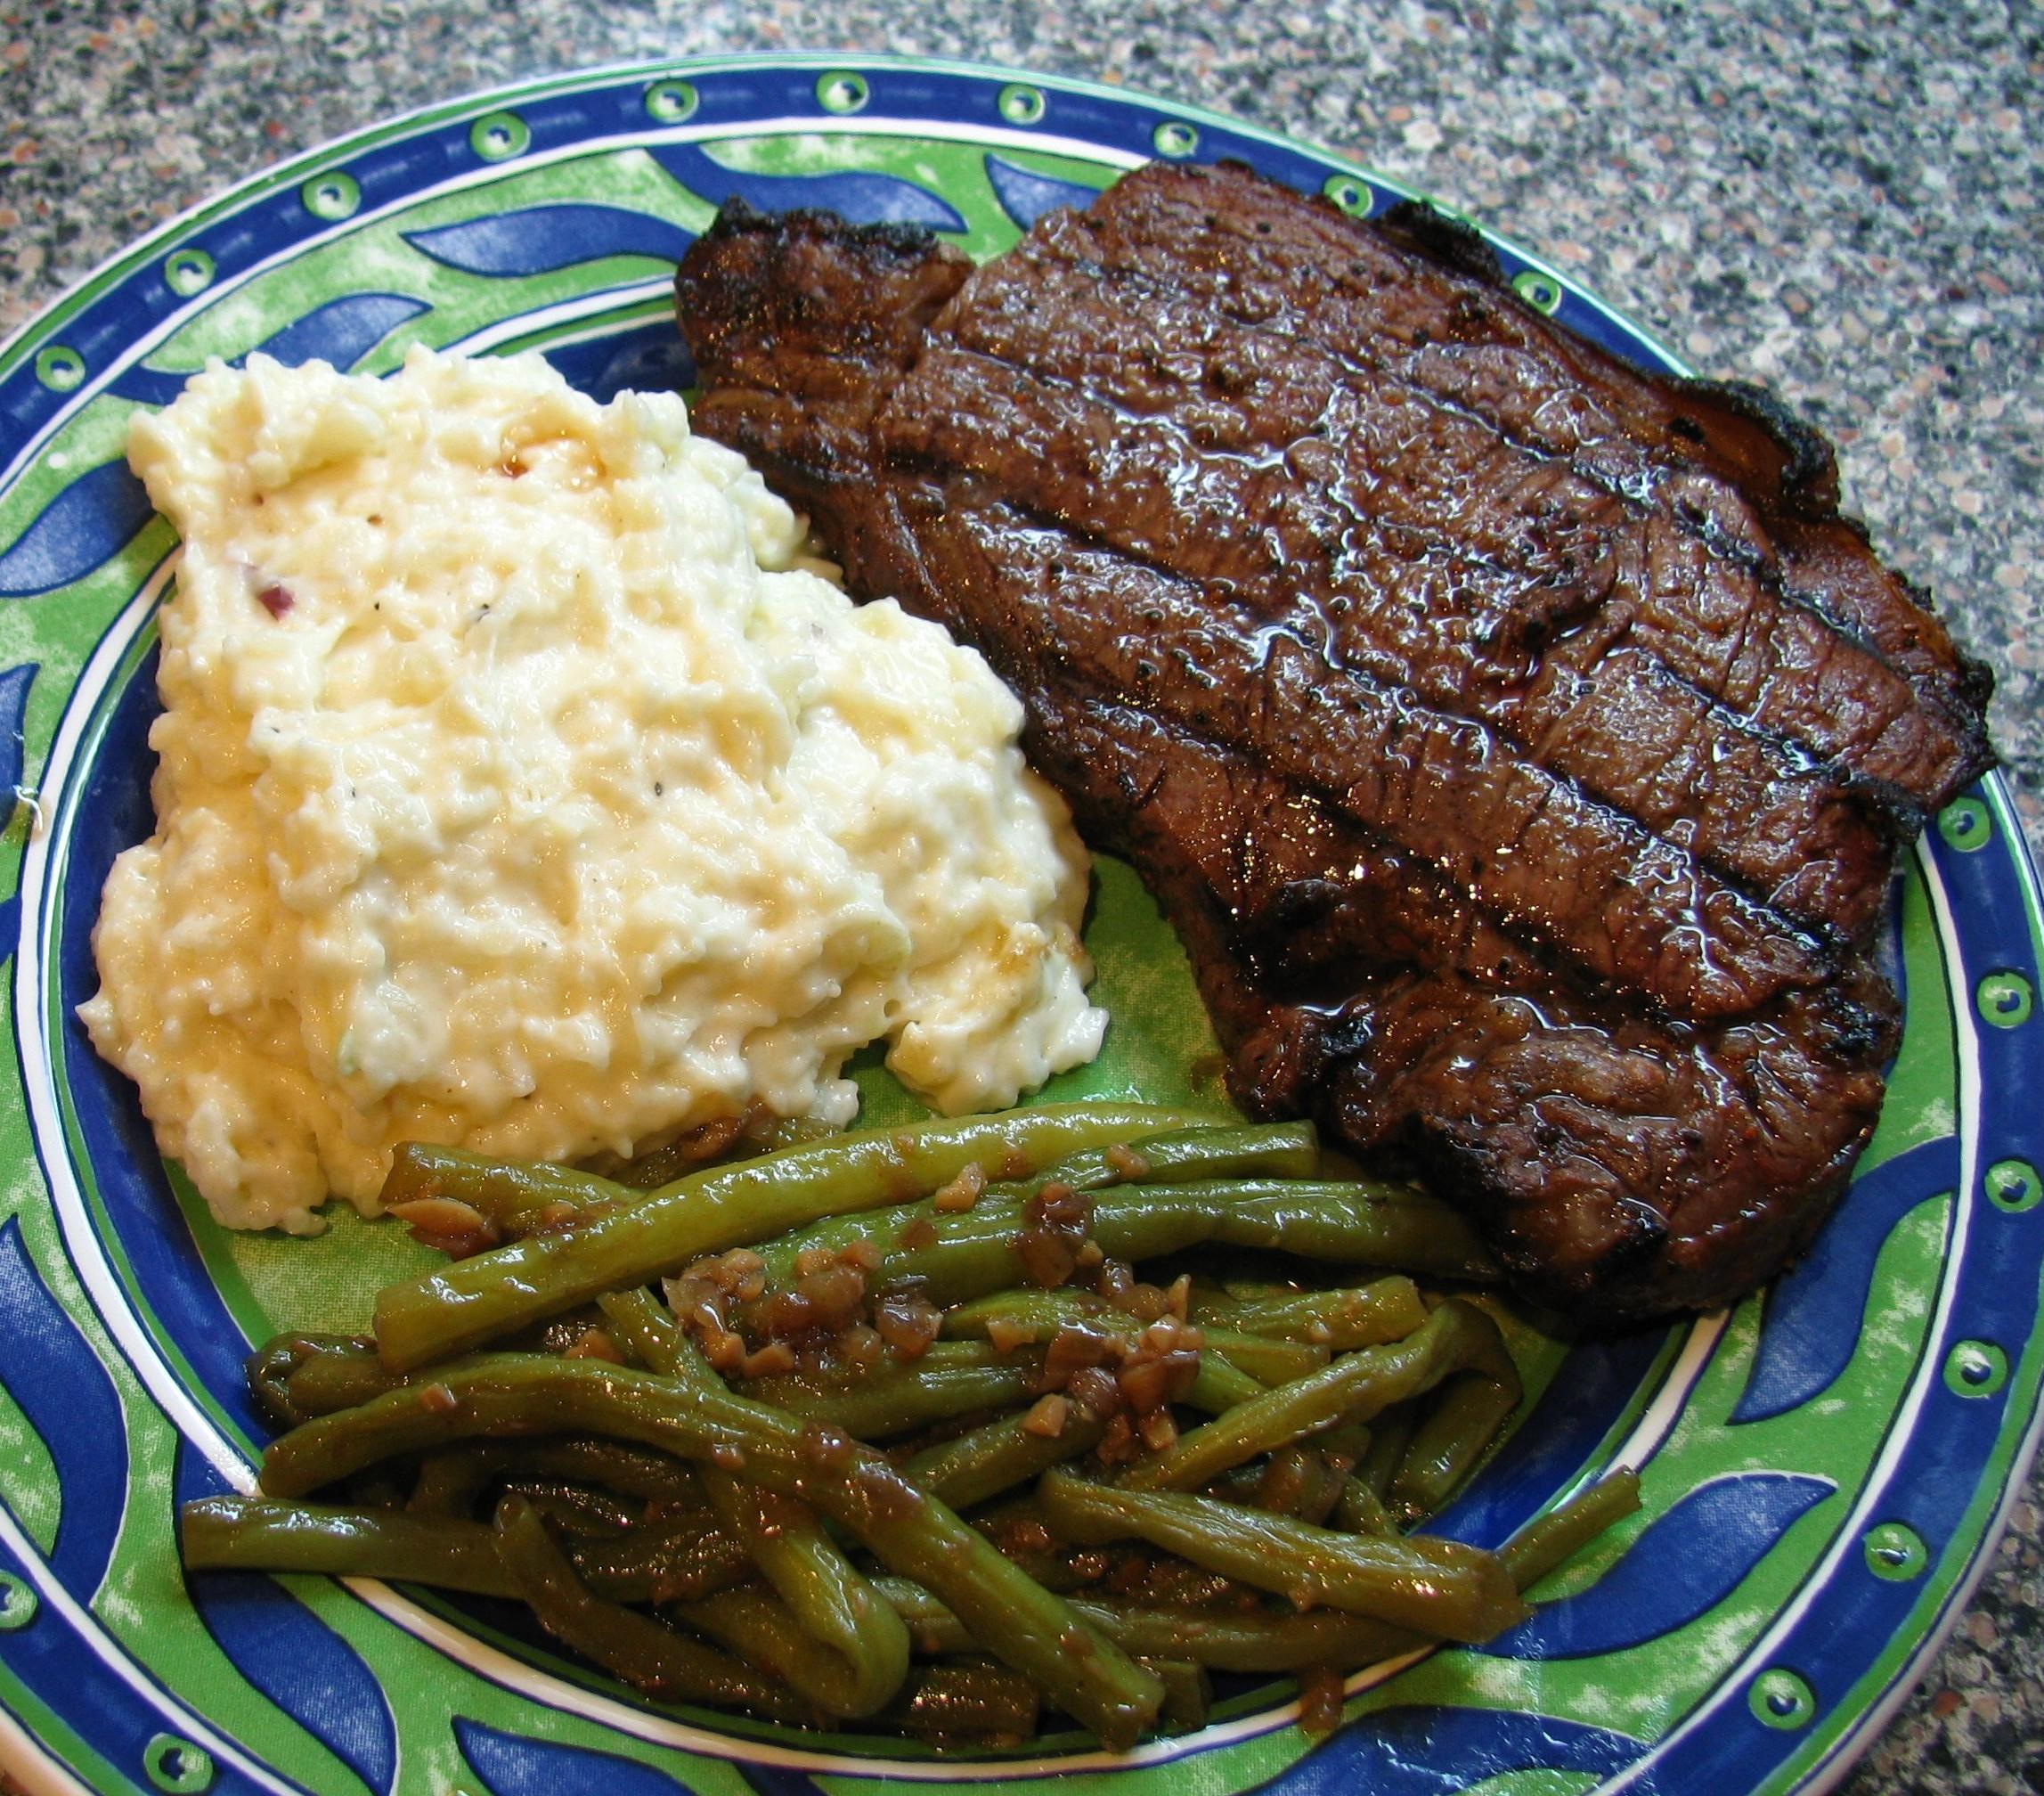 Steak_GreenBeans_GarlicMashedPotatoes